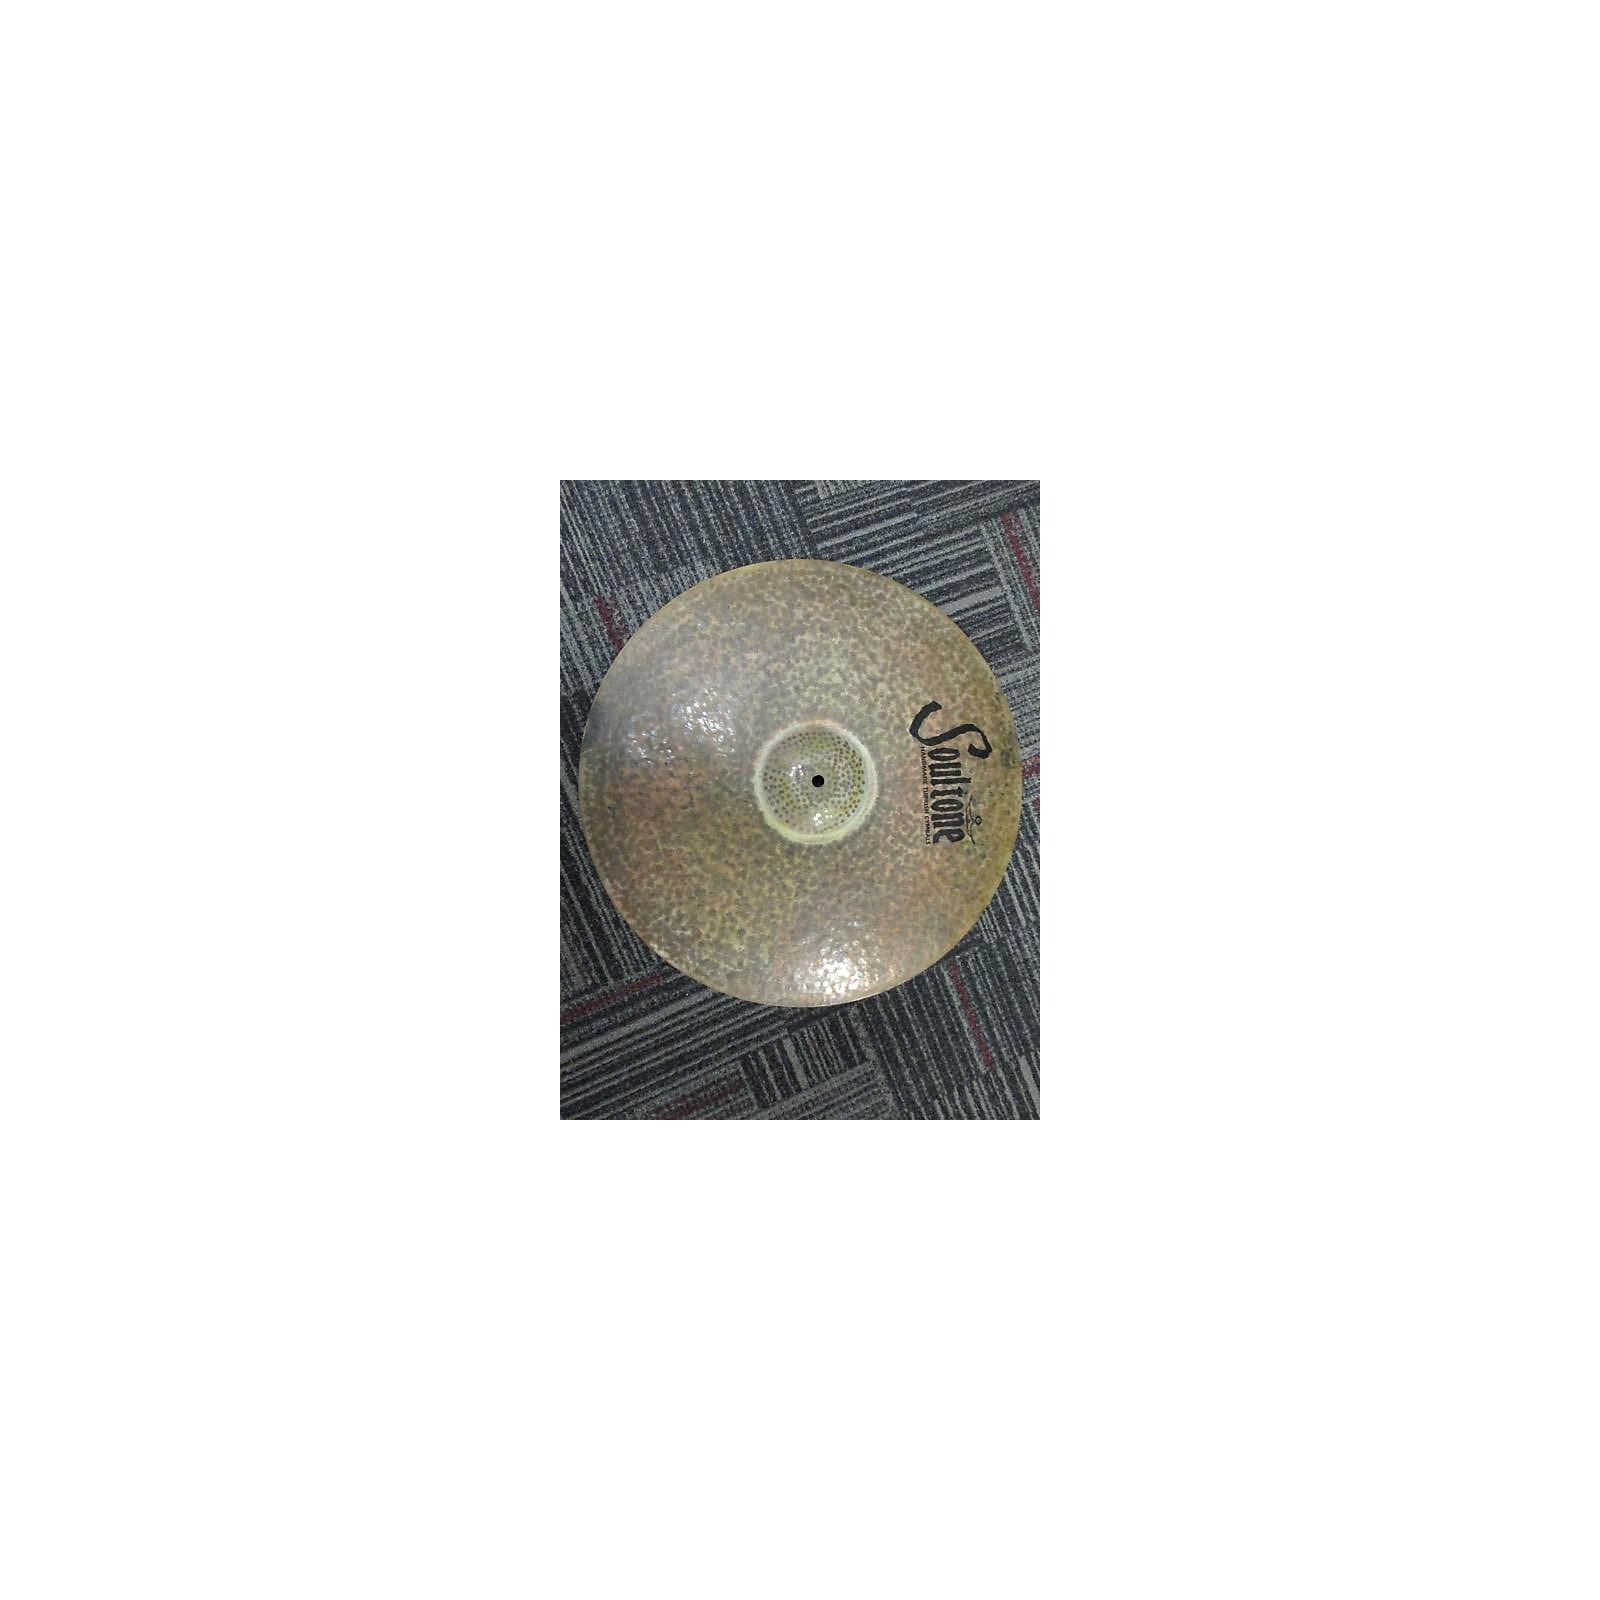 Soultone 20in NTR-CRR20 20 Cymbal